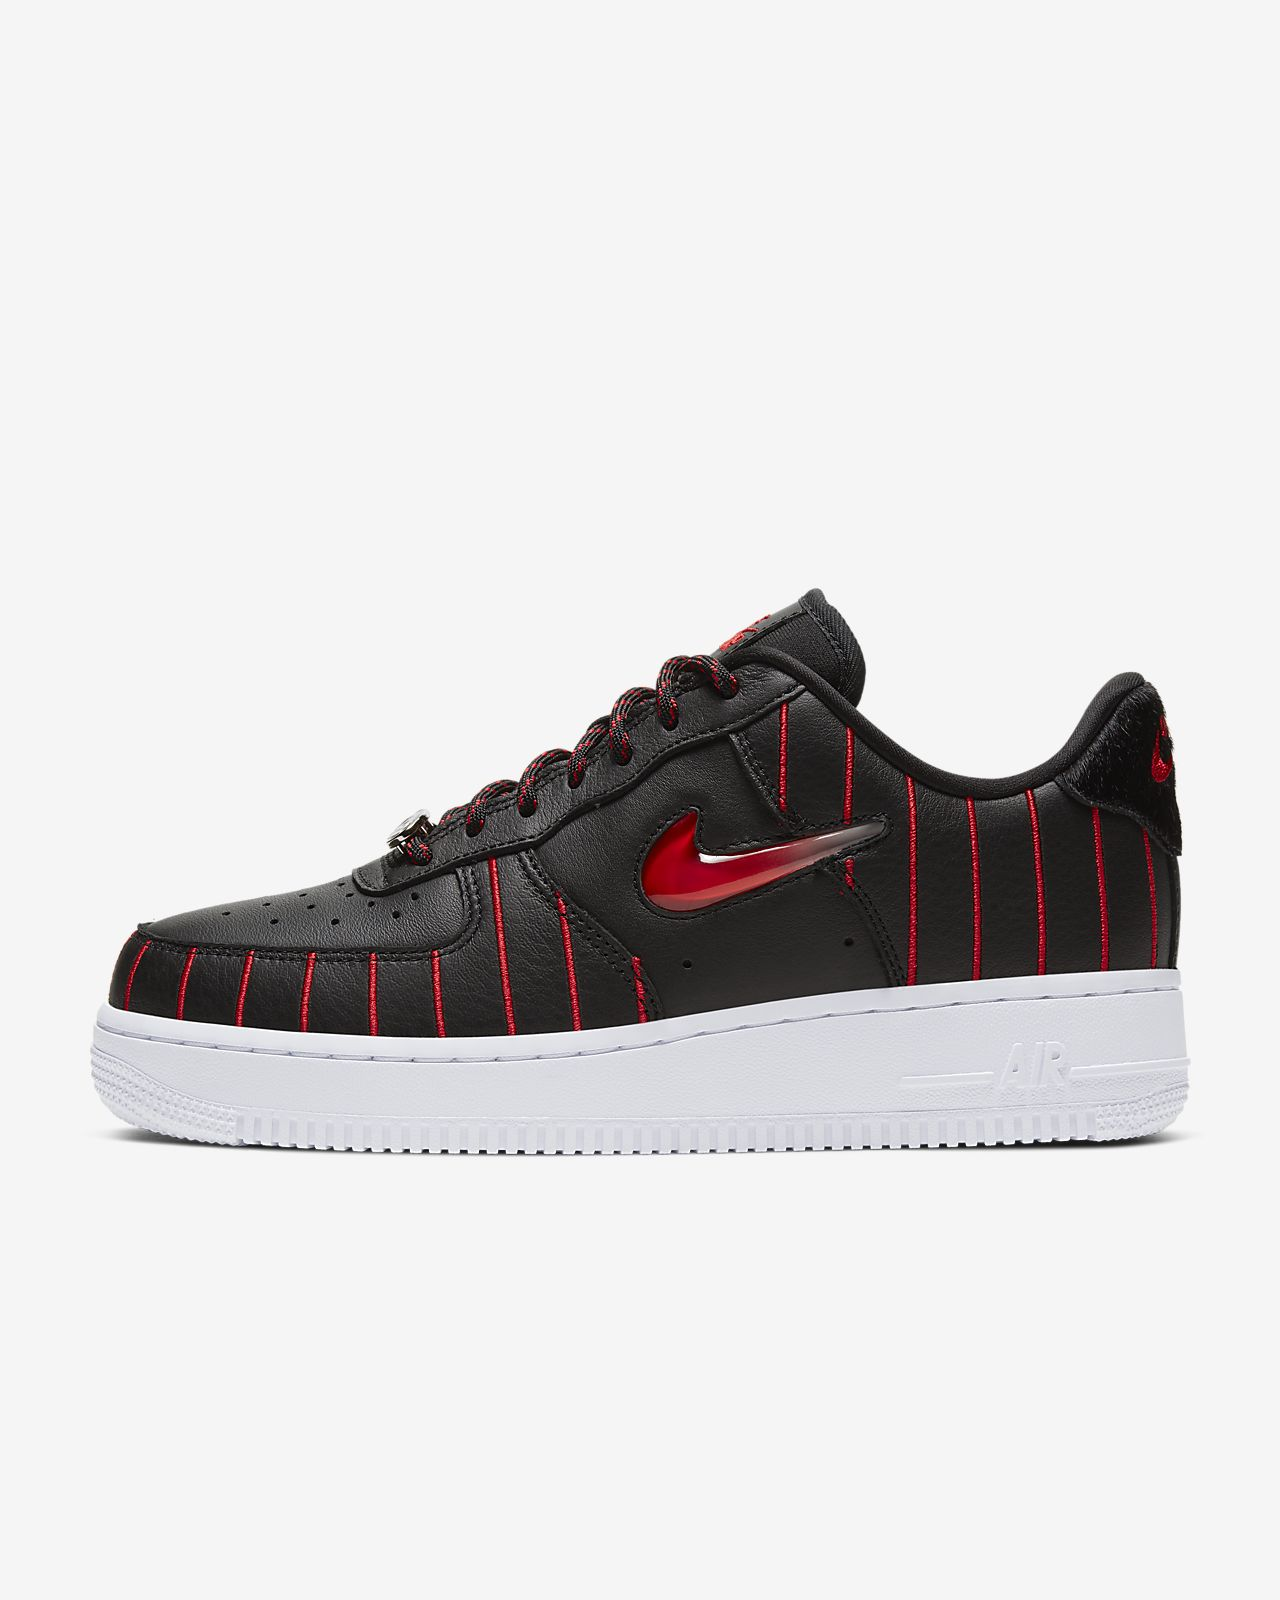 Sapatilhas Nike Air Force 1 Jewel